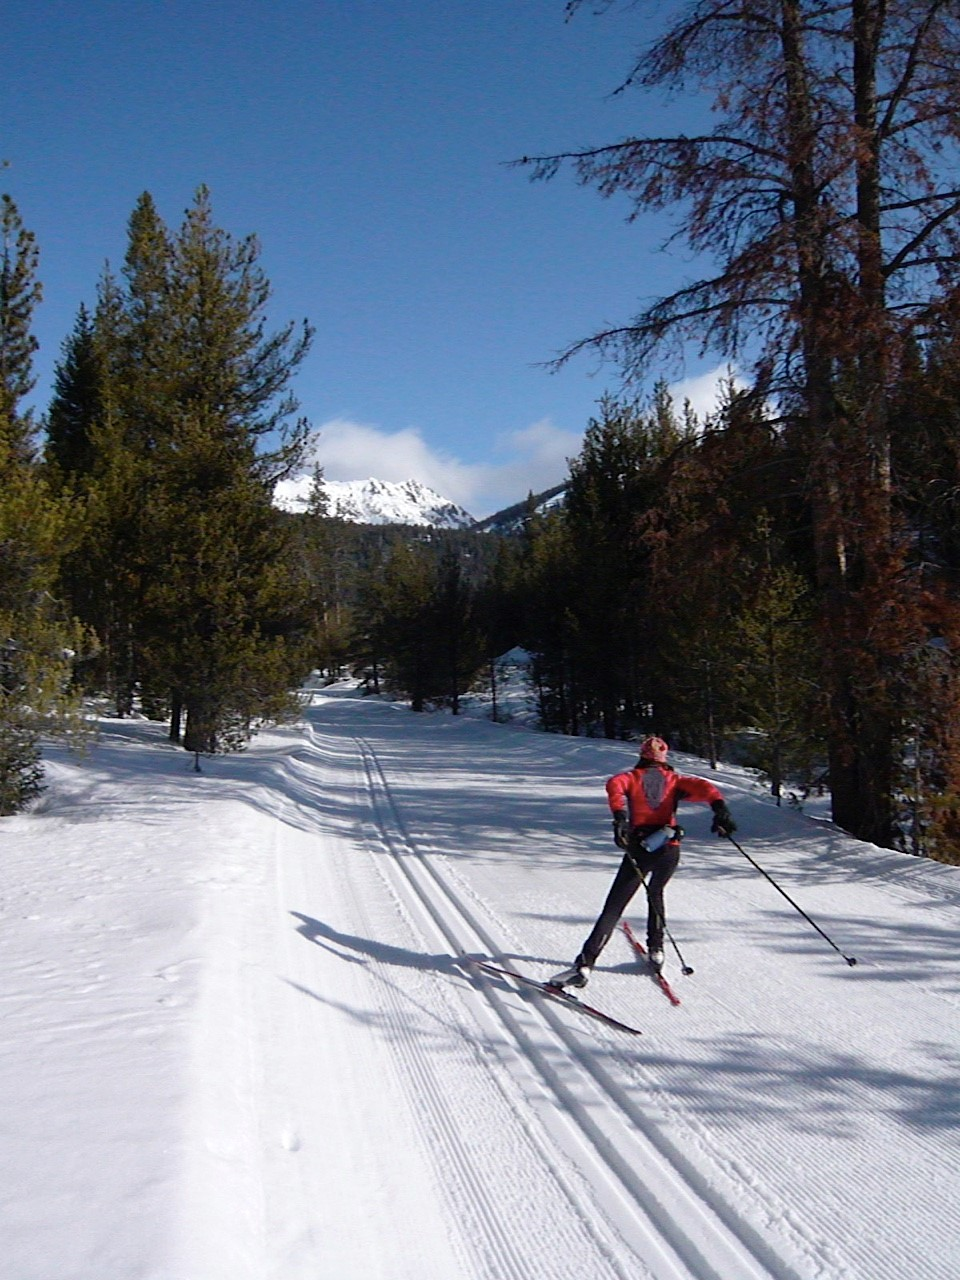 laurie xc ski